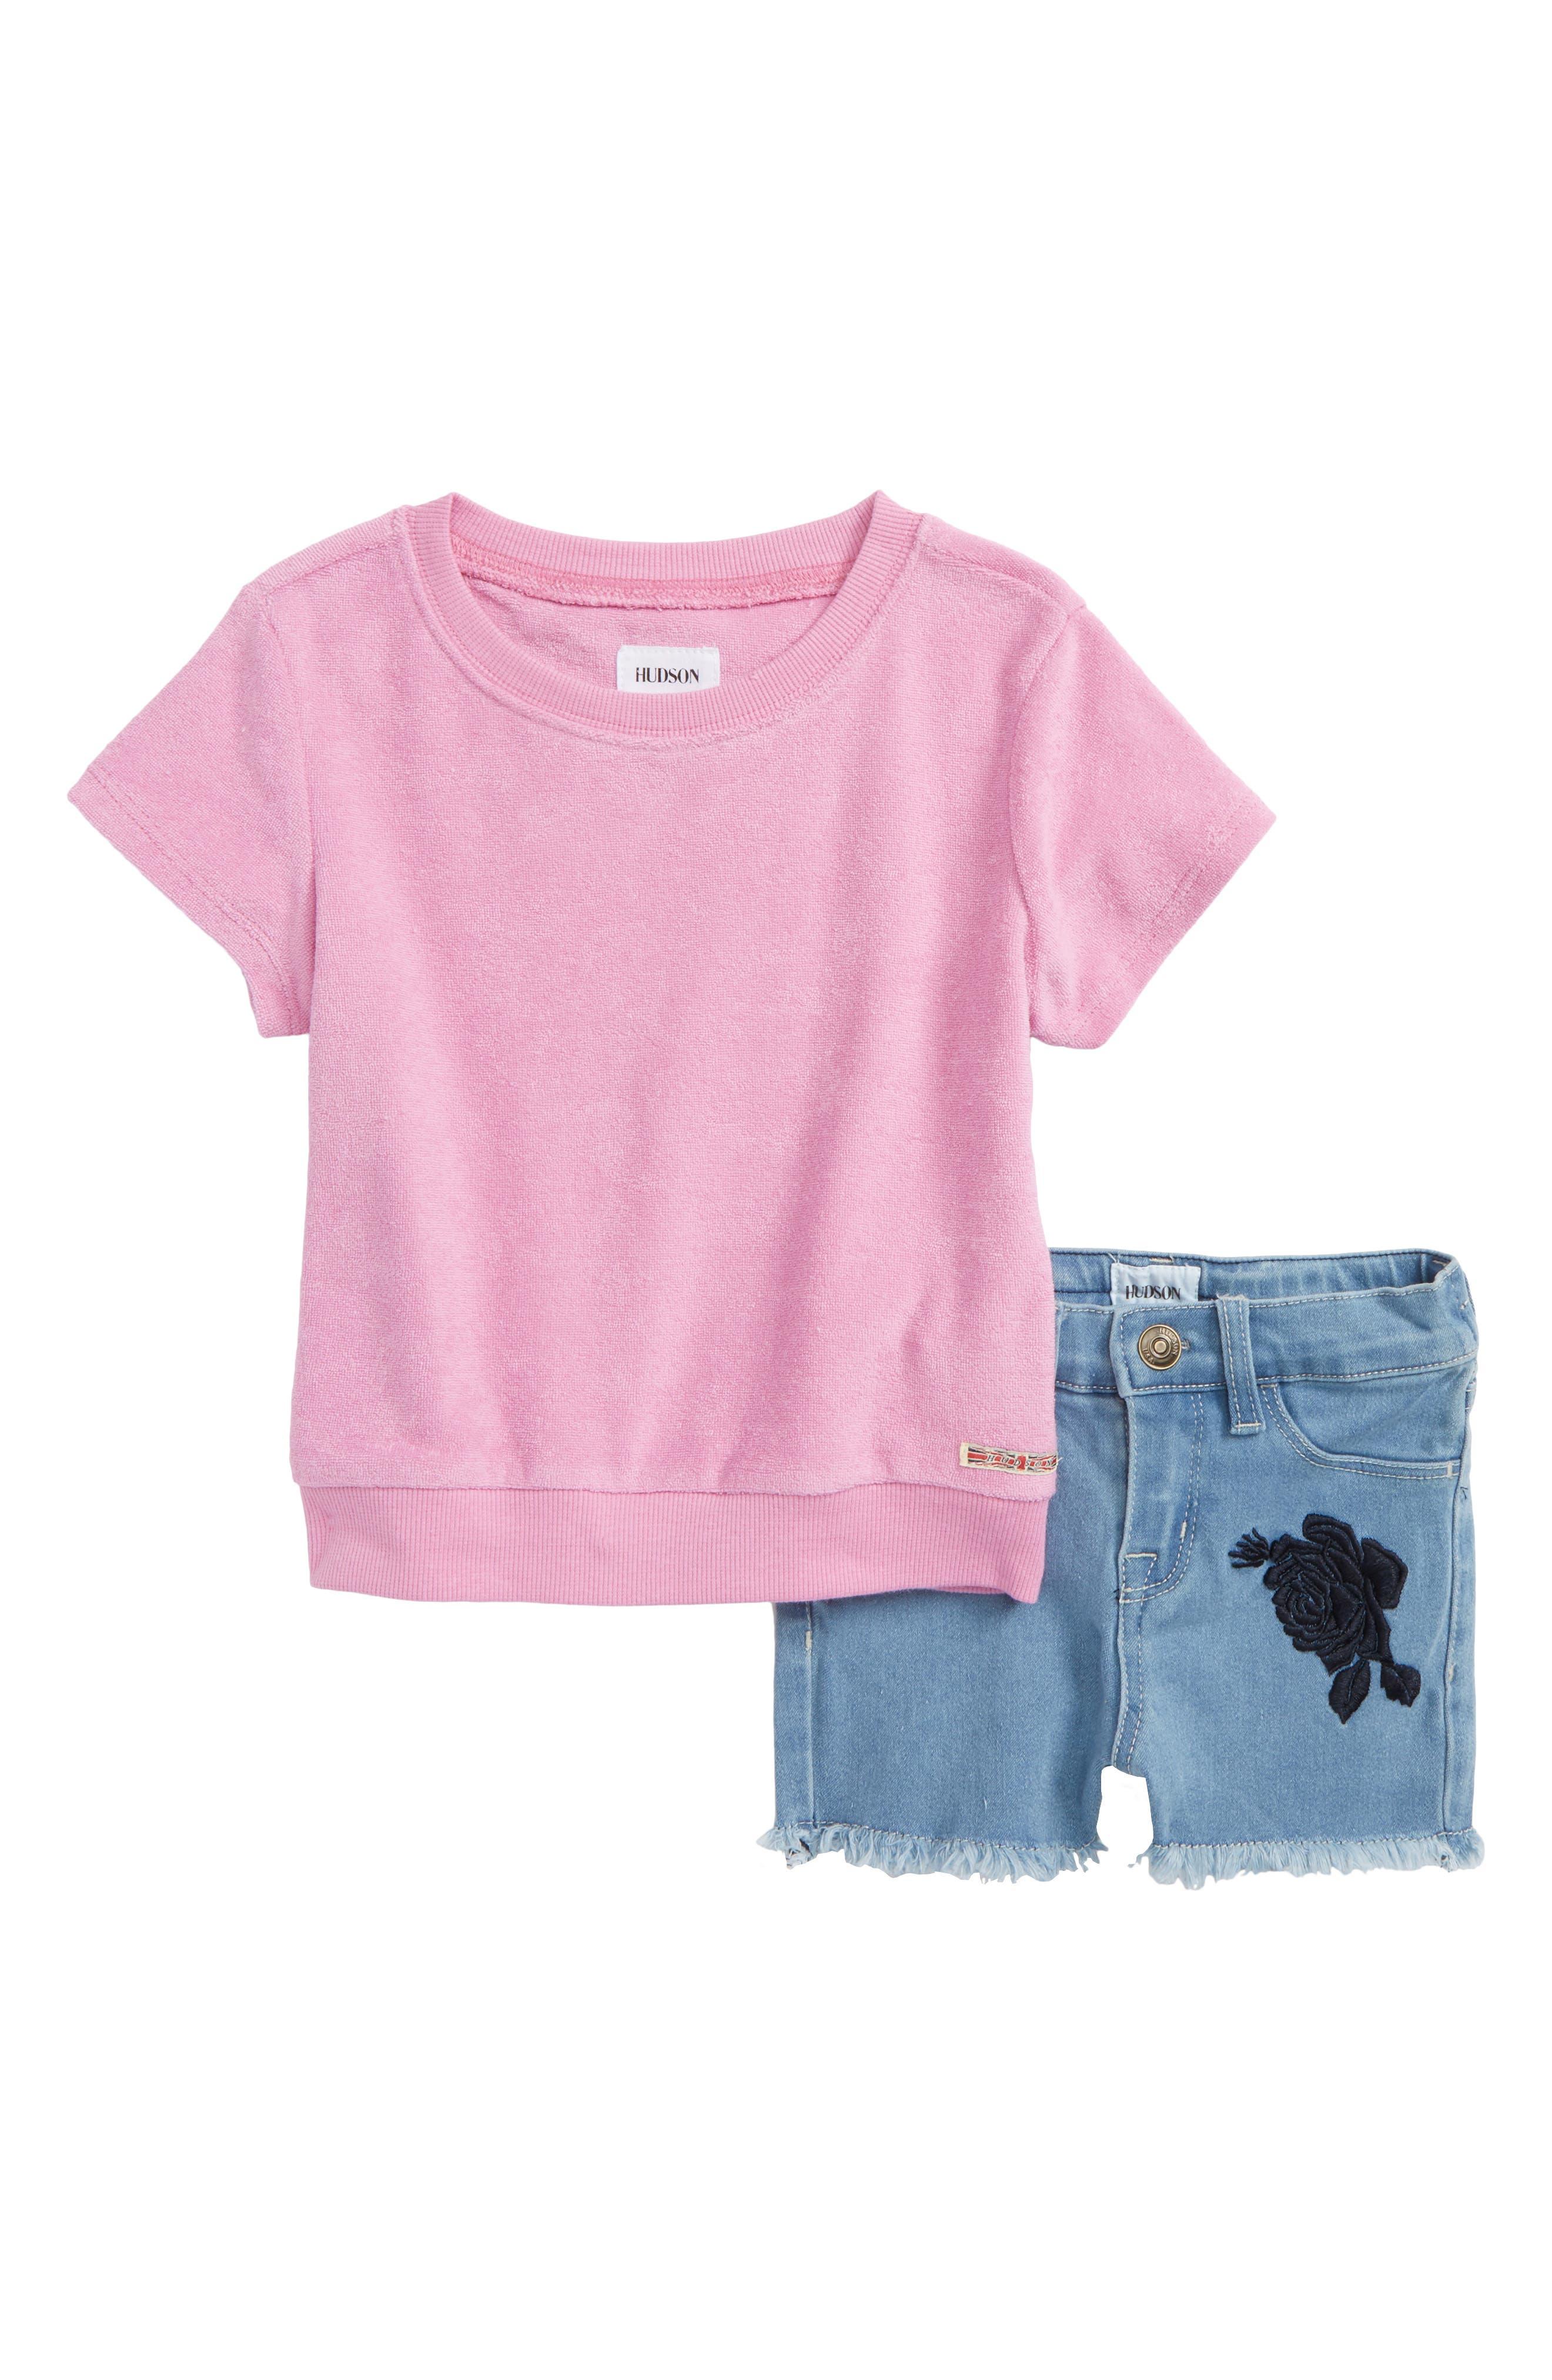 Alternate Image 1 Selected - Hudson Kids French Terry Tee & Shorts Set (Toddler Girls)